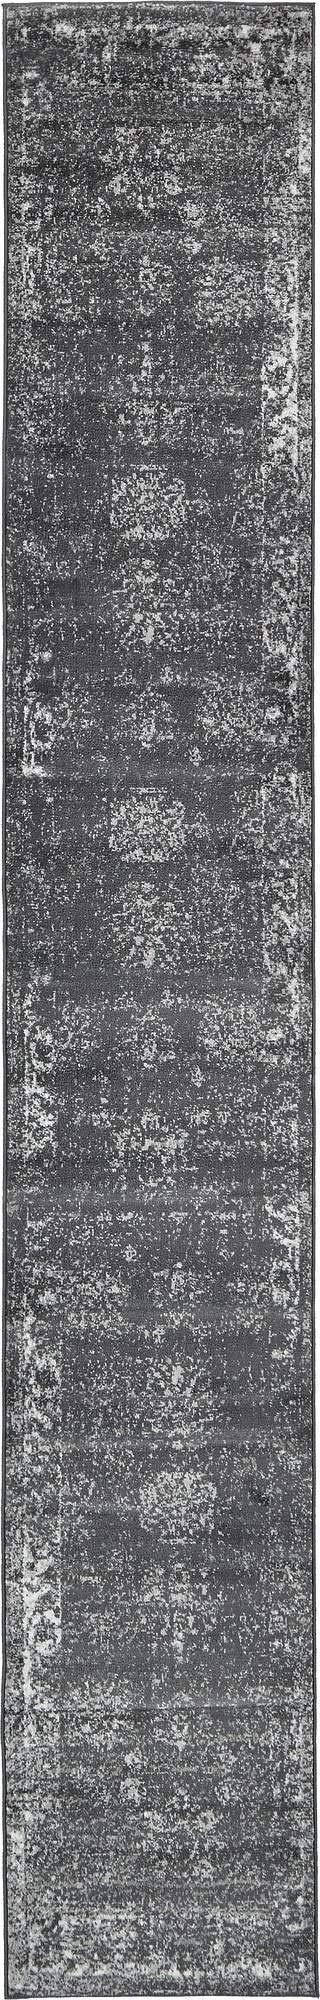 Unique Loom 3134055 Area Rug, 2' x 13' Runner, Dark